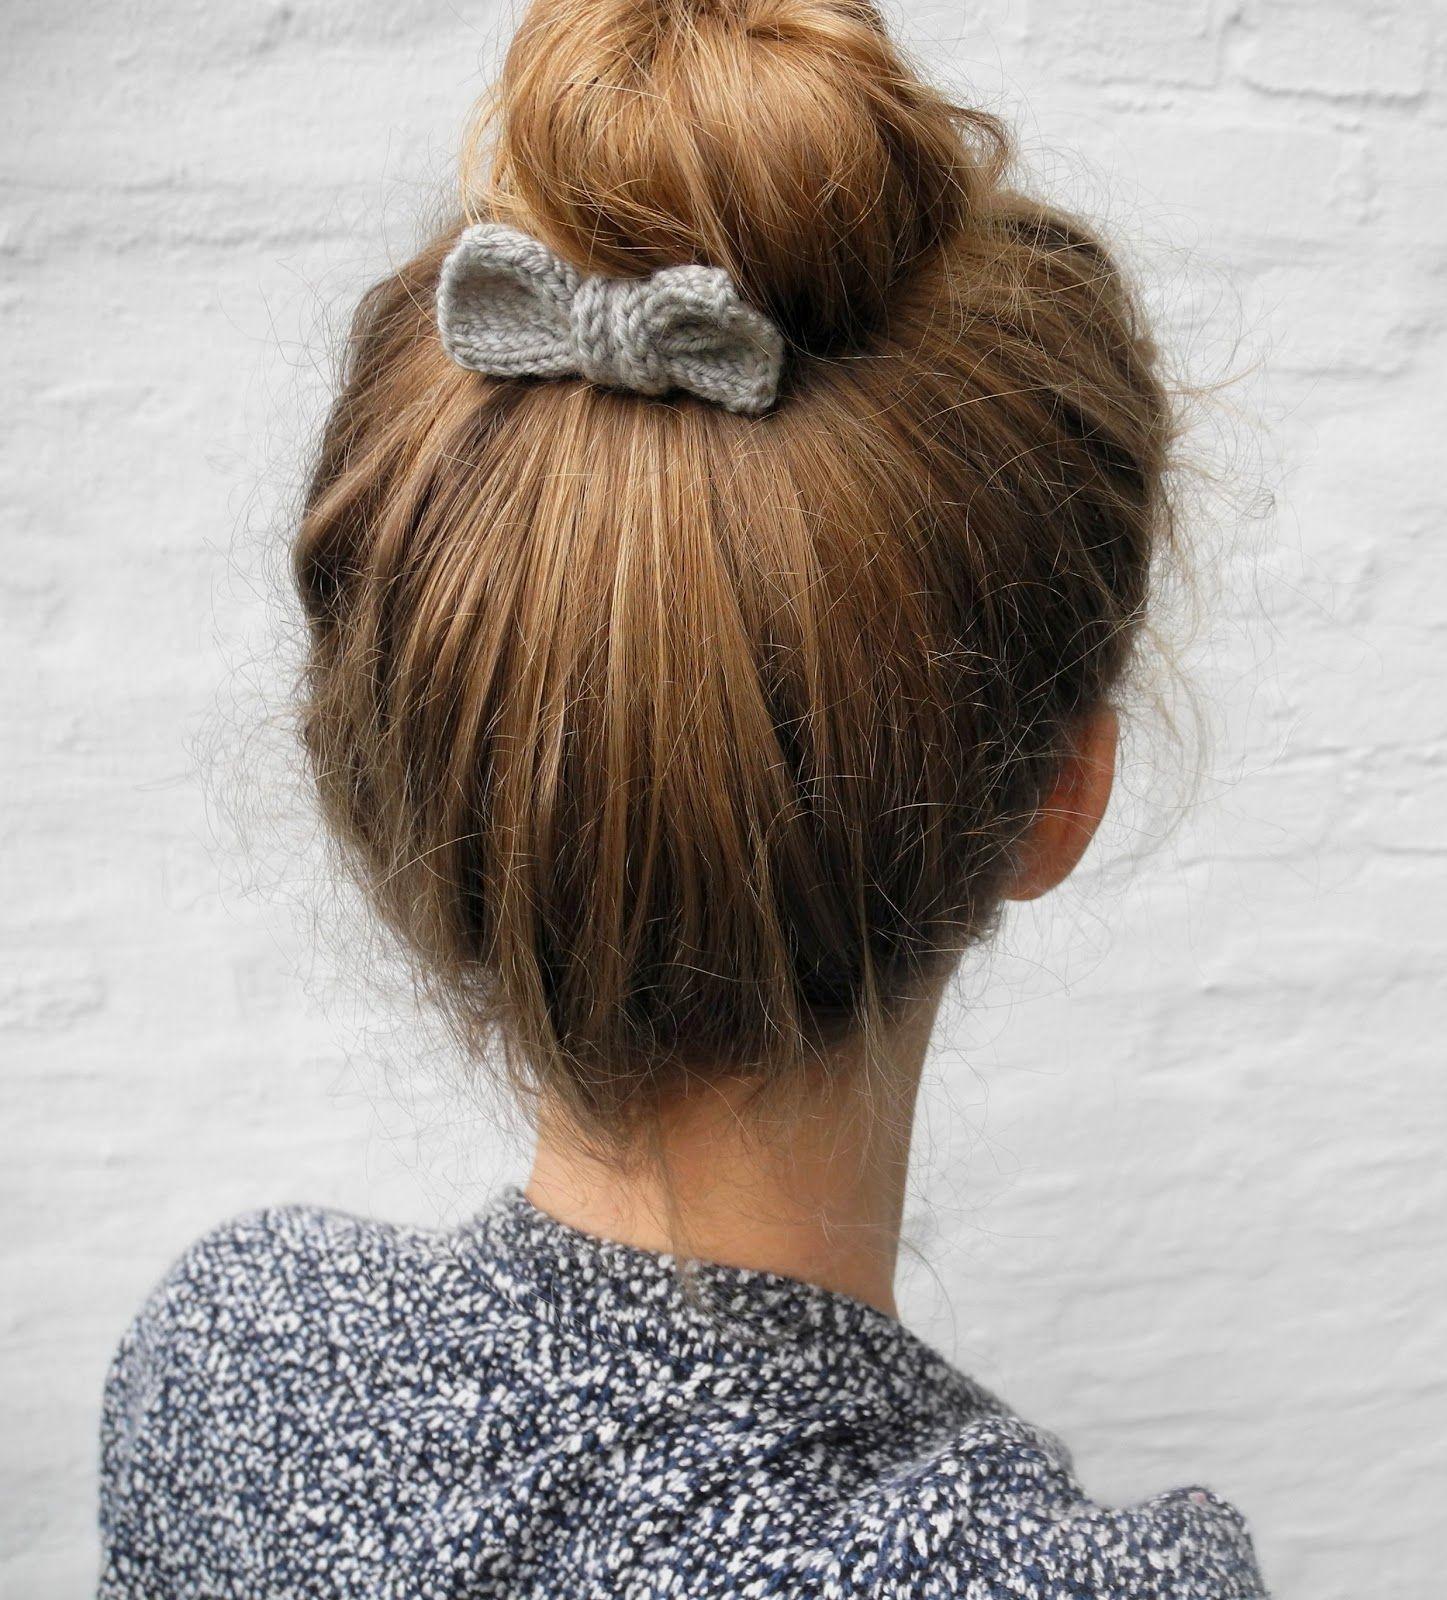 Hair bow hairstyles i love pinterest hair bow crochet and